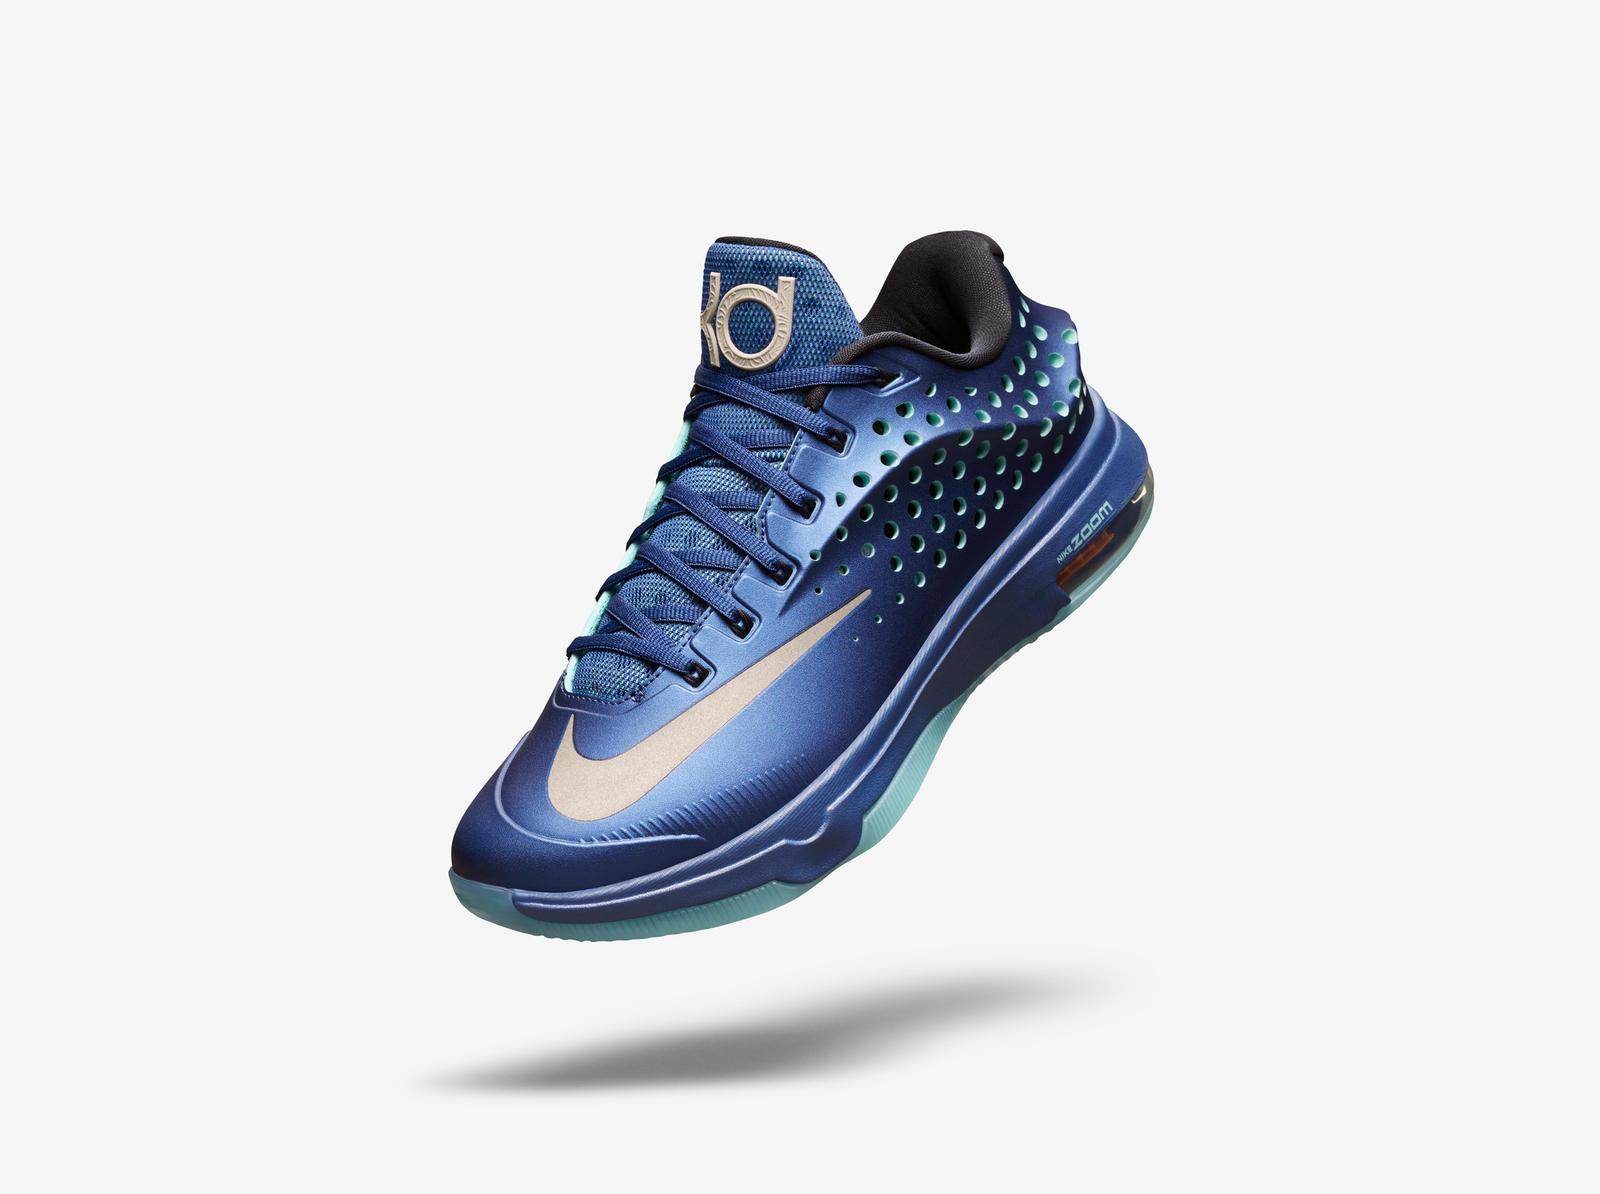 foamposites for basketball lebron nike elite shoes